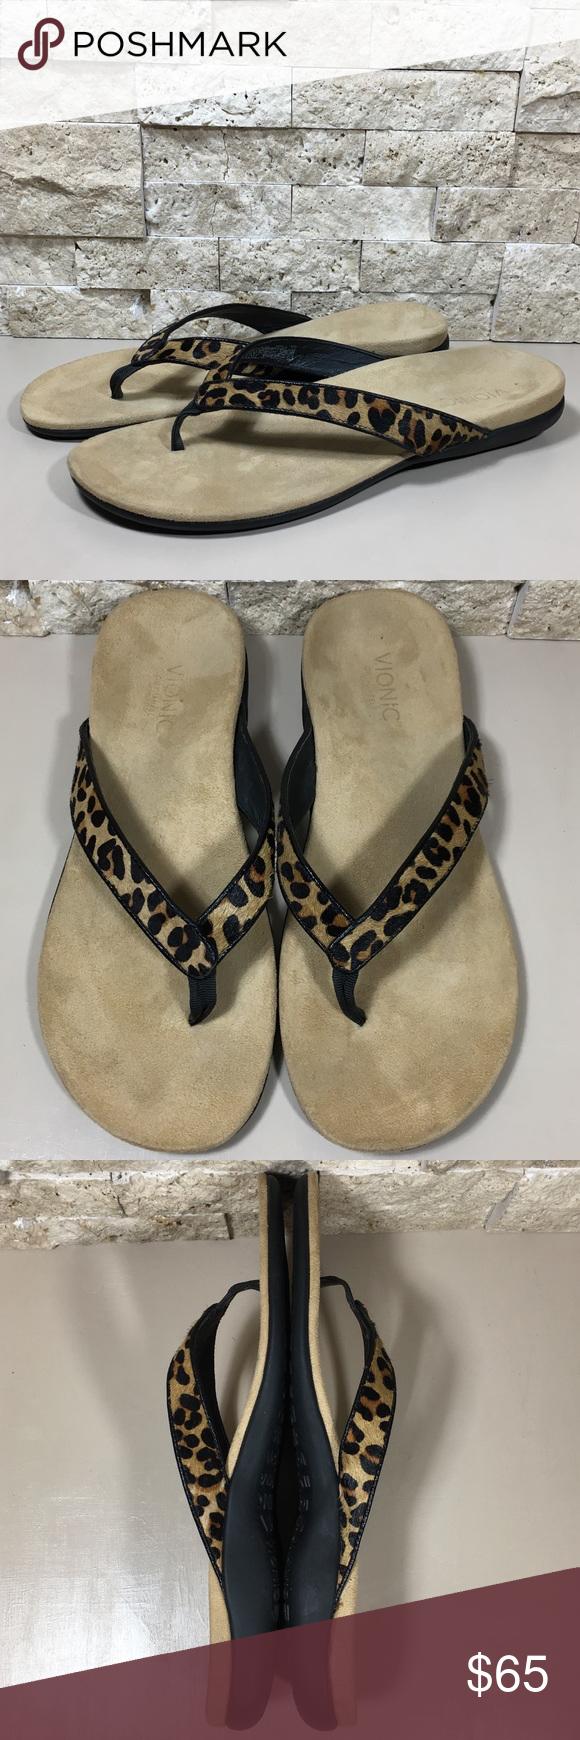 67a2adf8c5b830 Vionic Flip Flop Sandals Orthaheel Leopard Selena Vionic Selena leopard  print calf hair leather flip flop